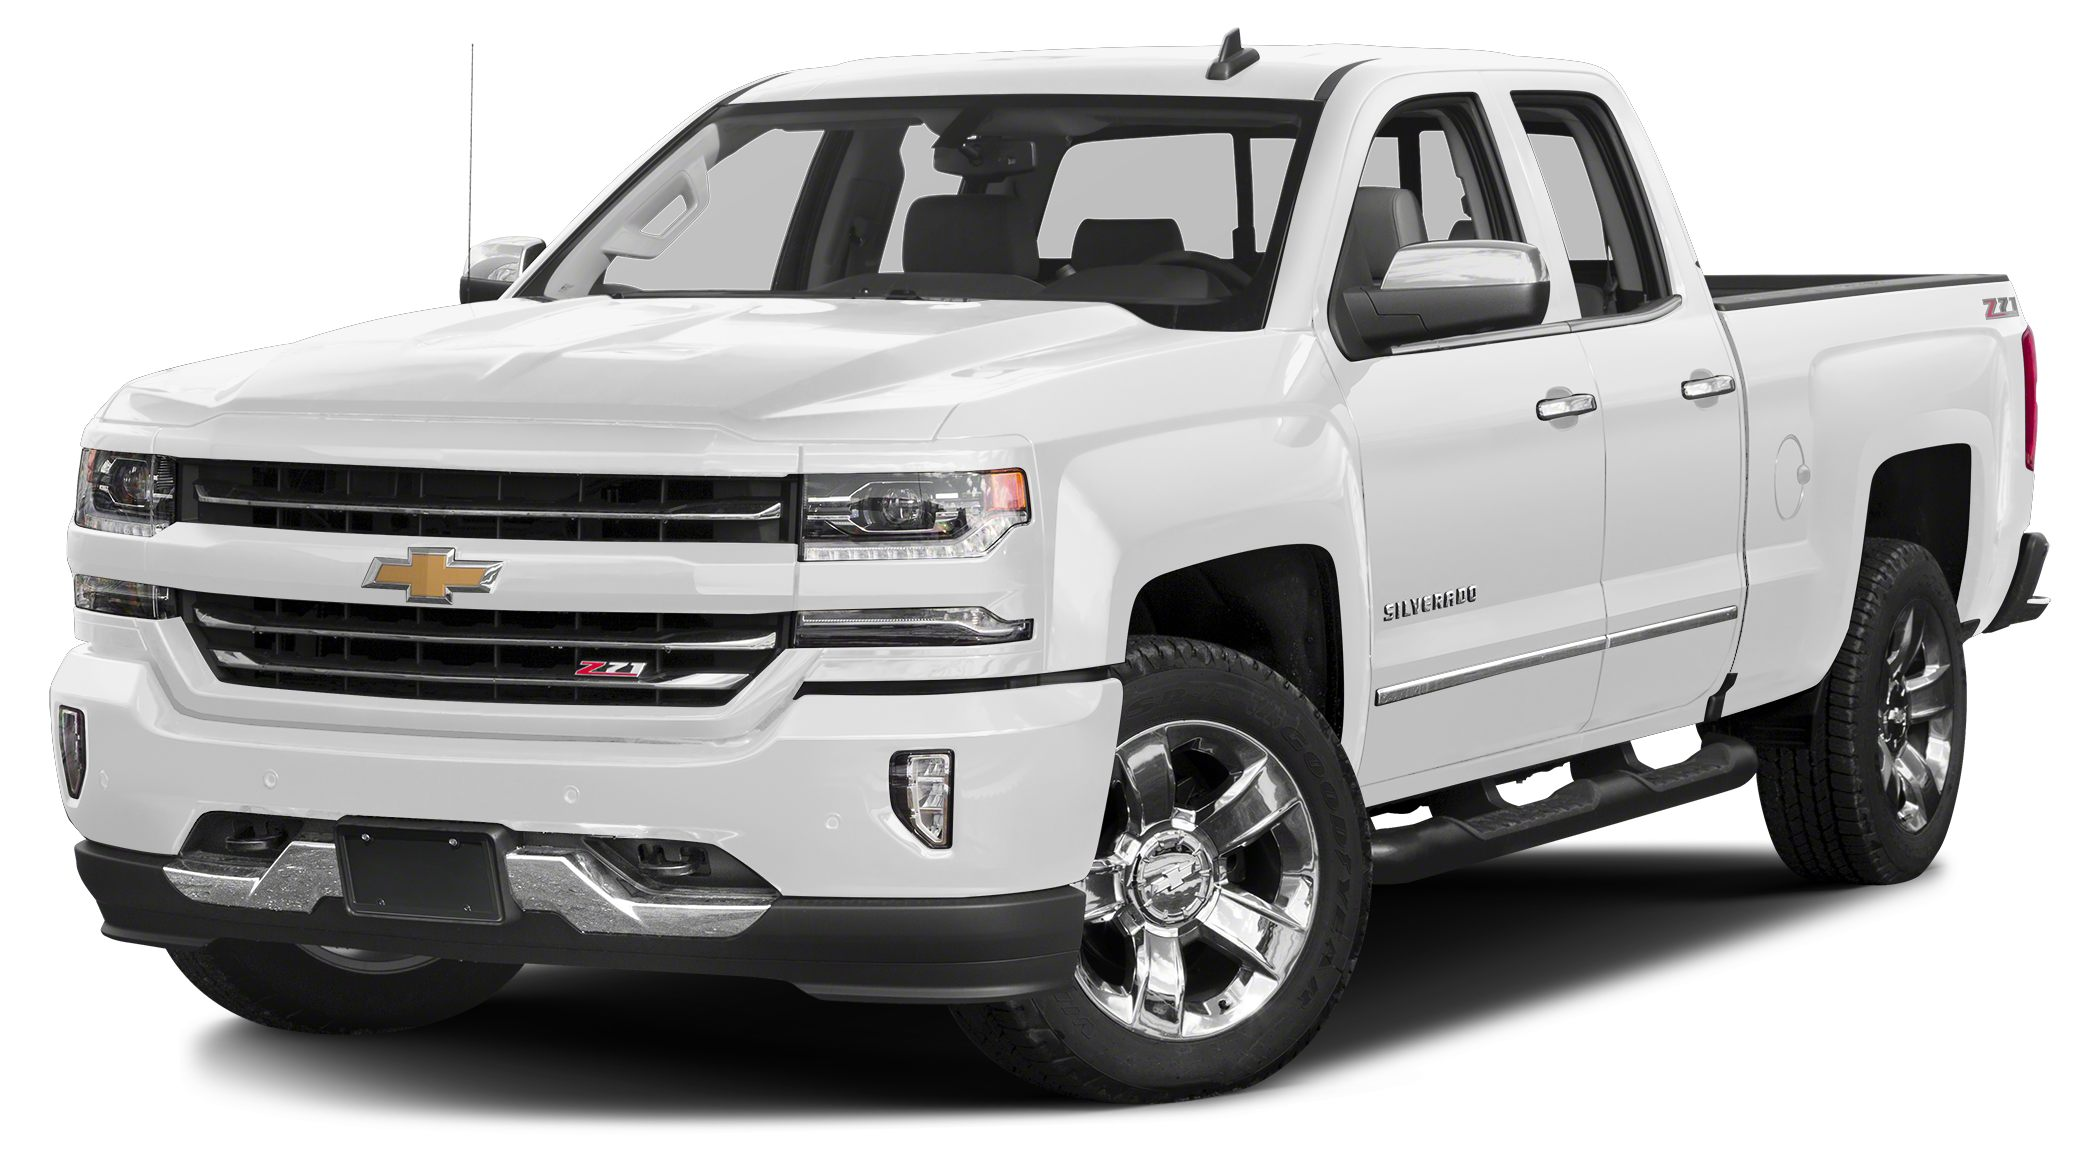 fleet chevy silverado pick-up.jpg